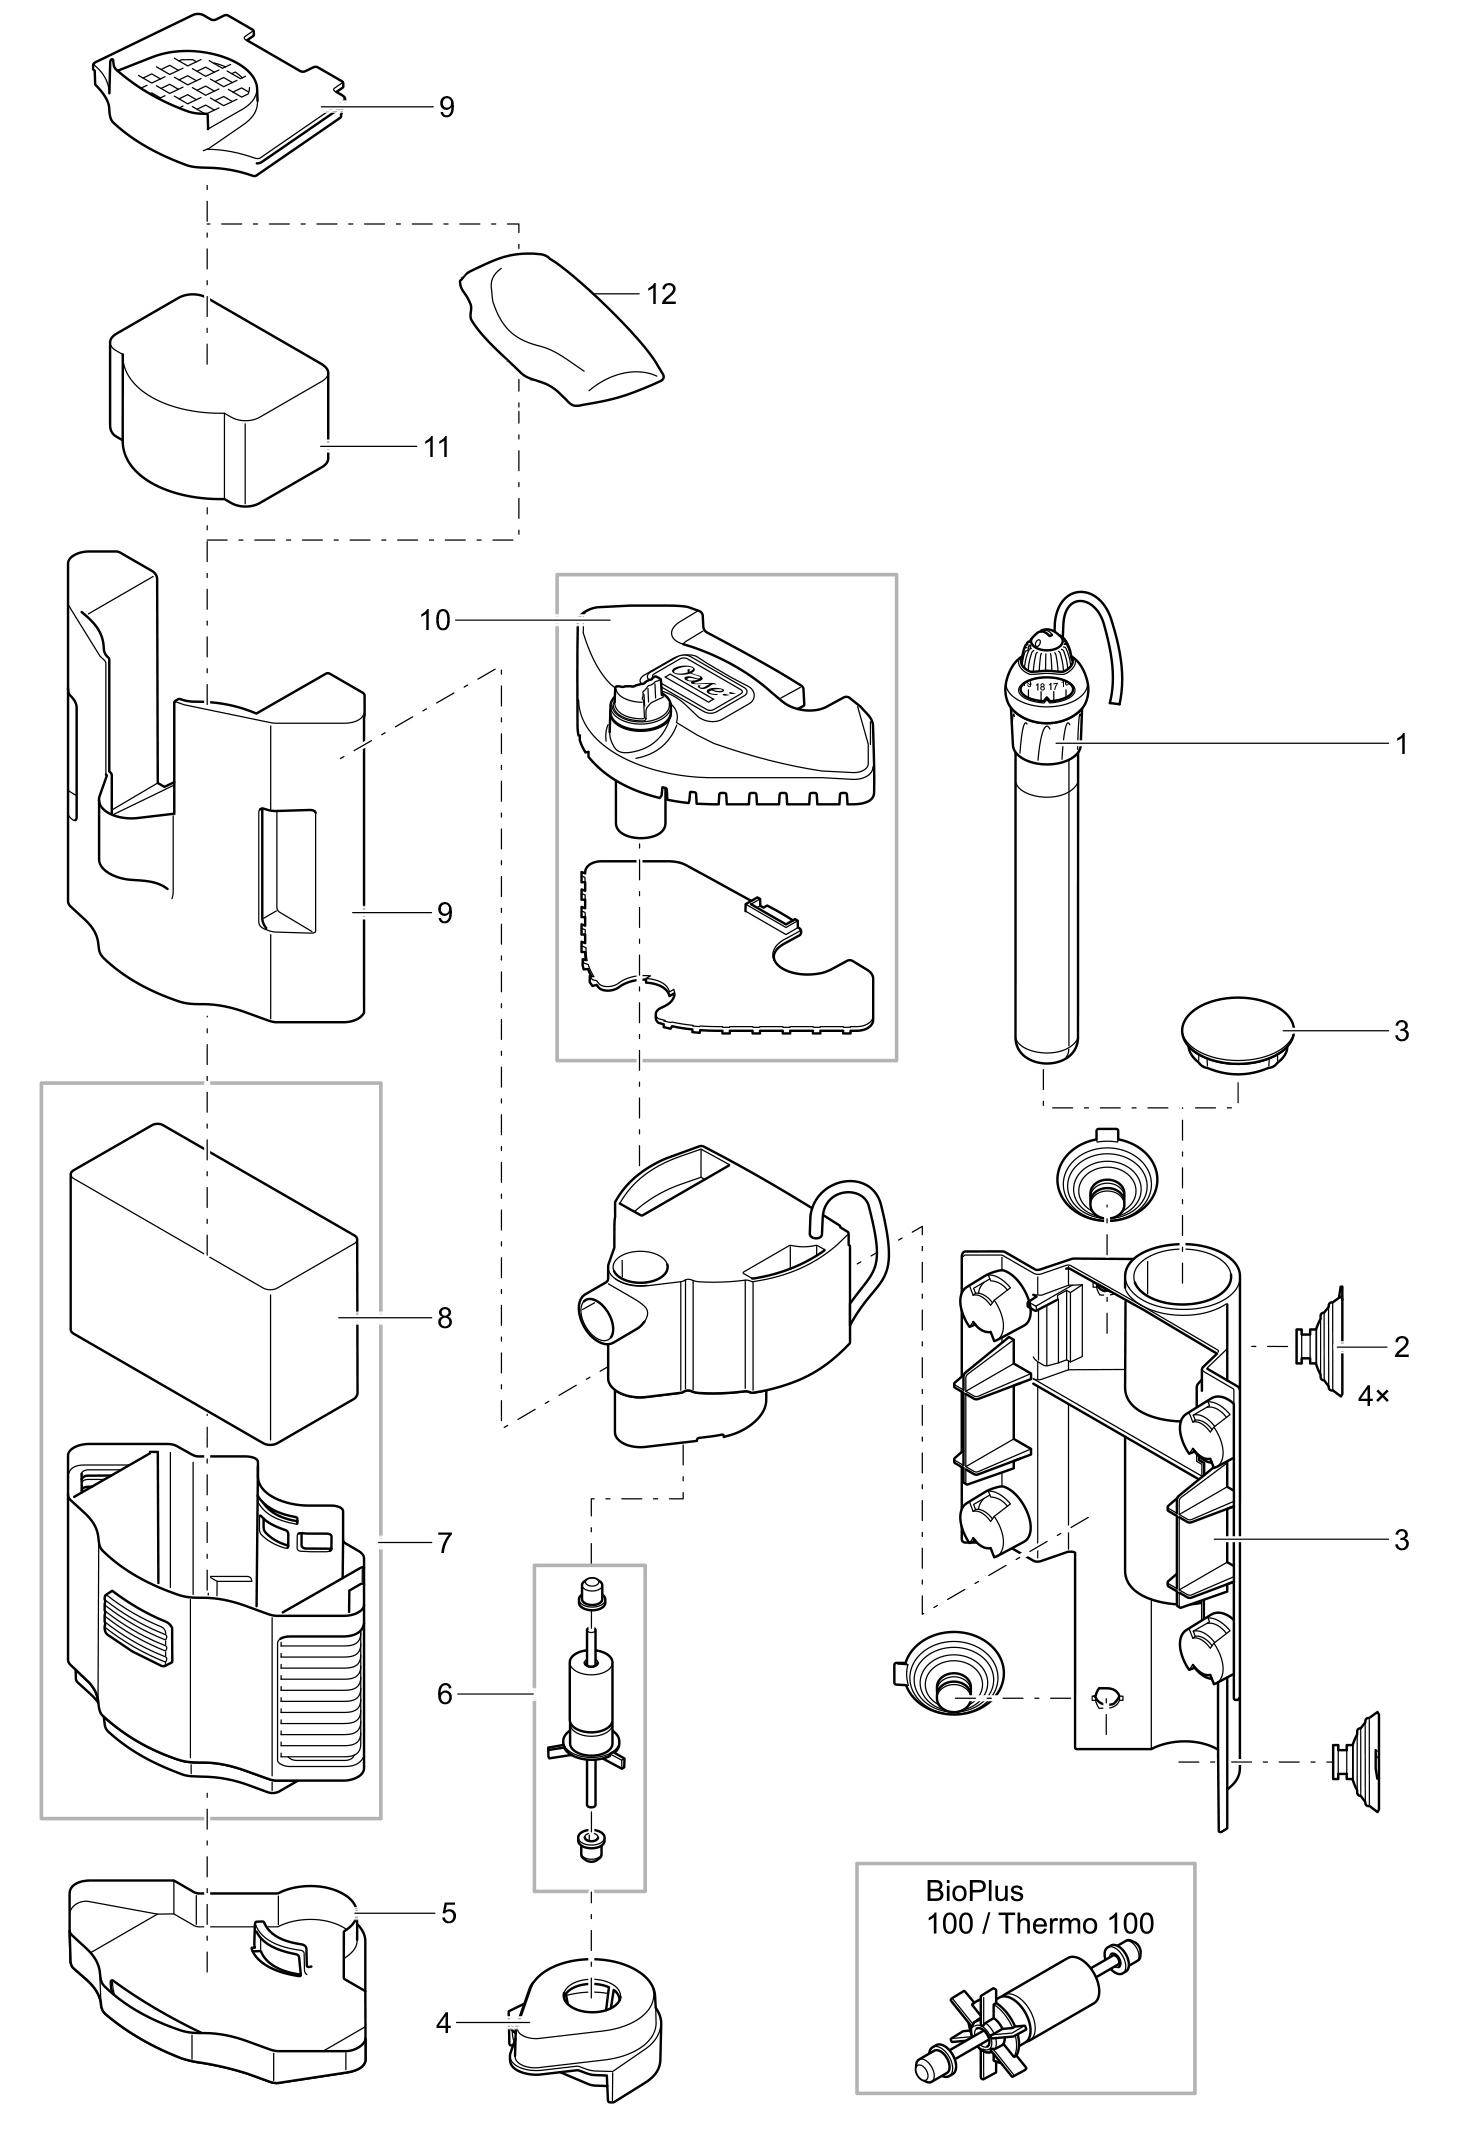 BioPlus thermo 100.jpg